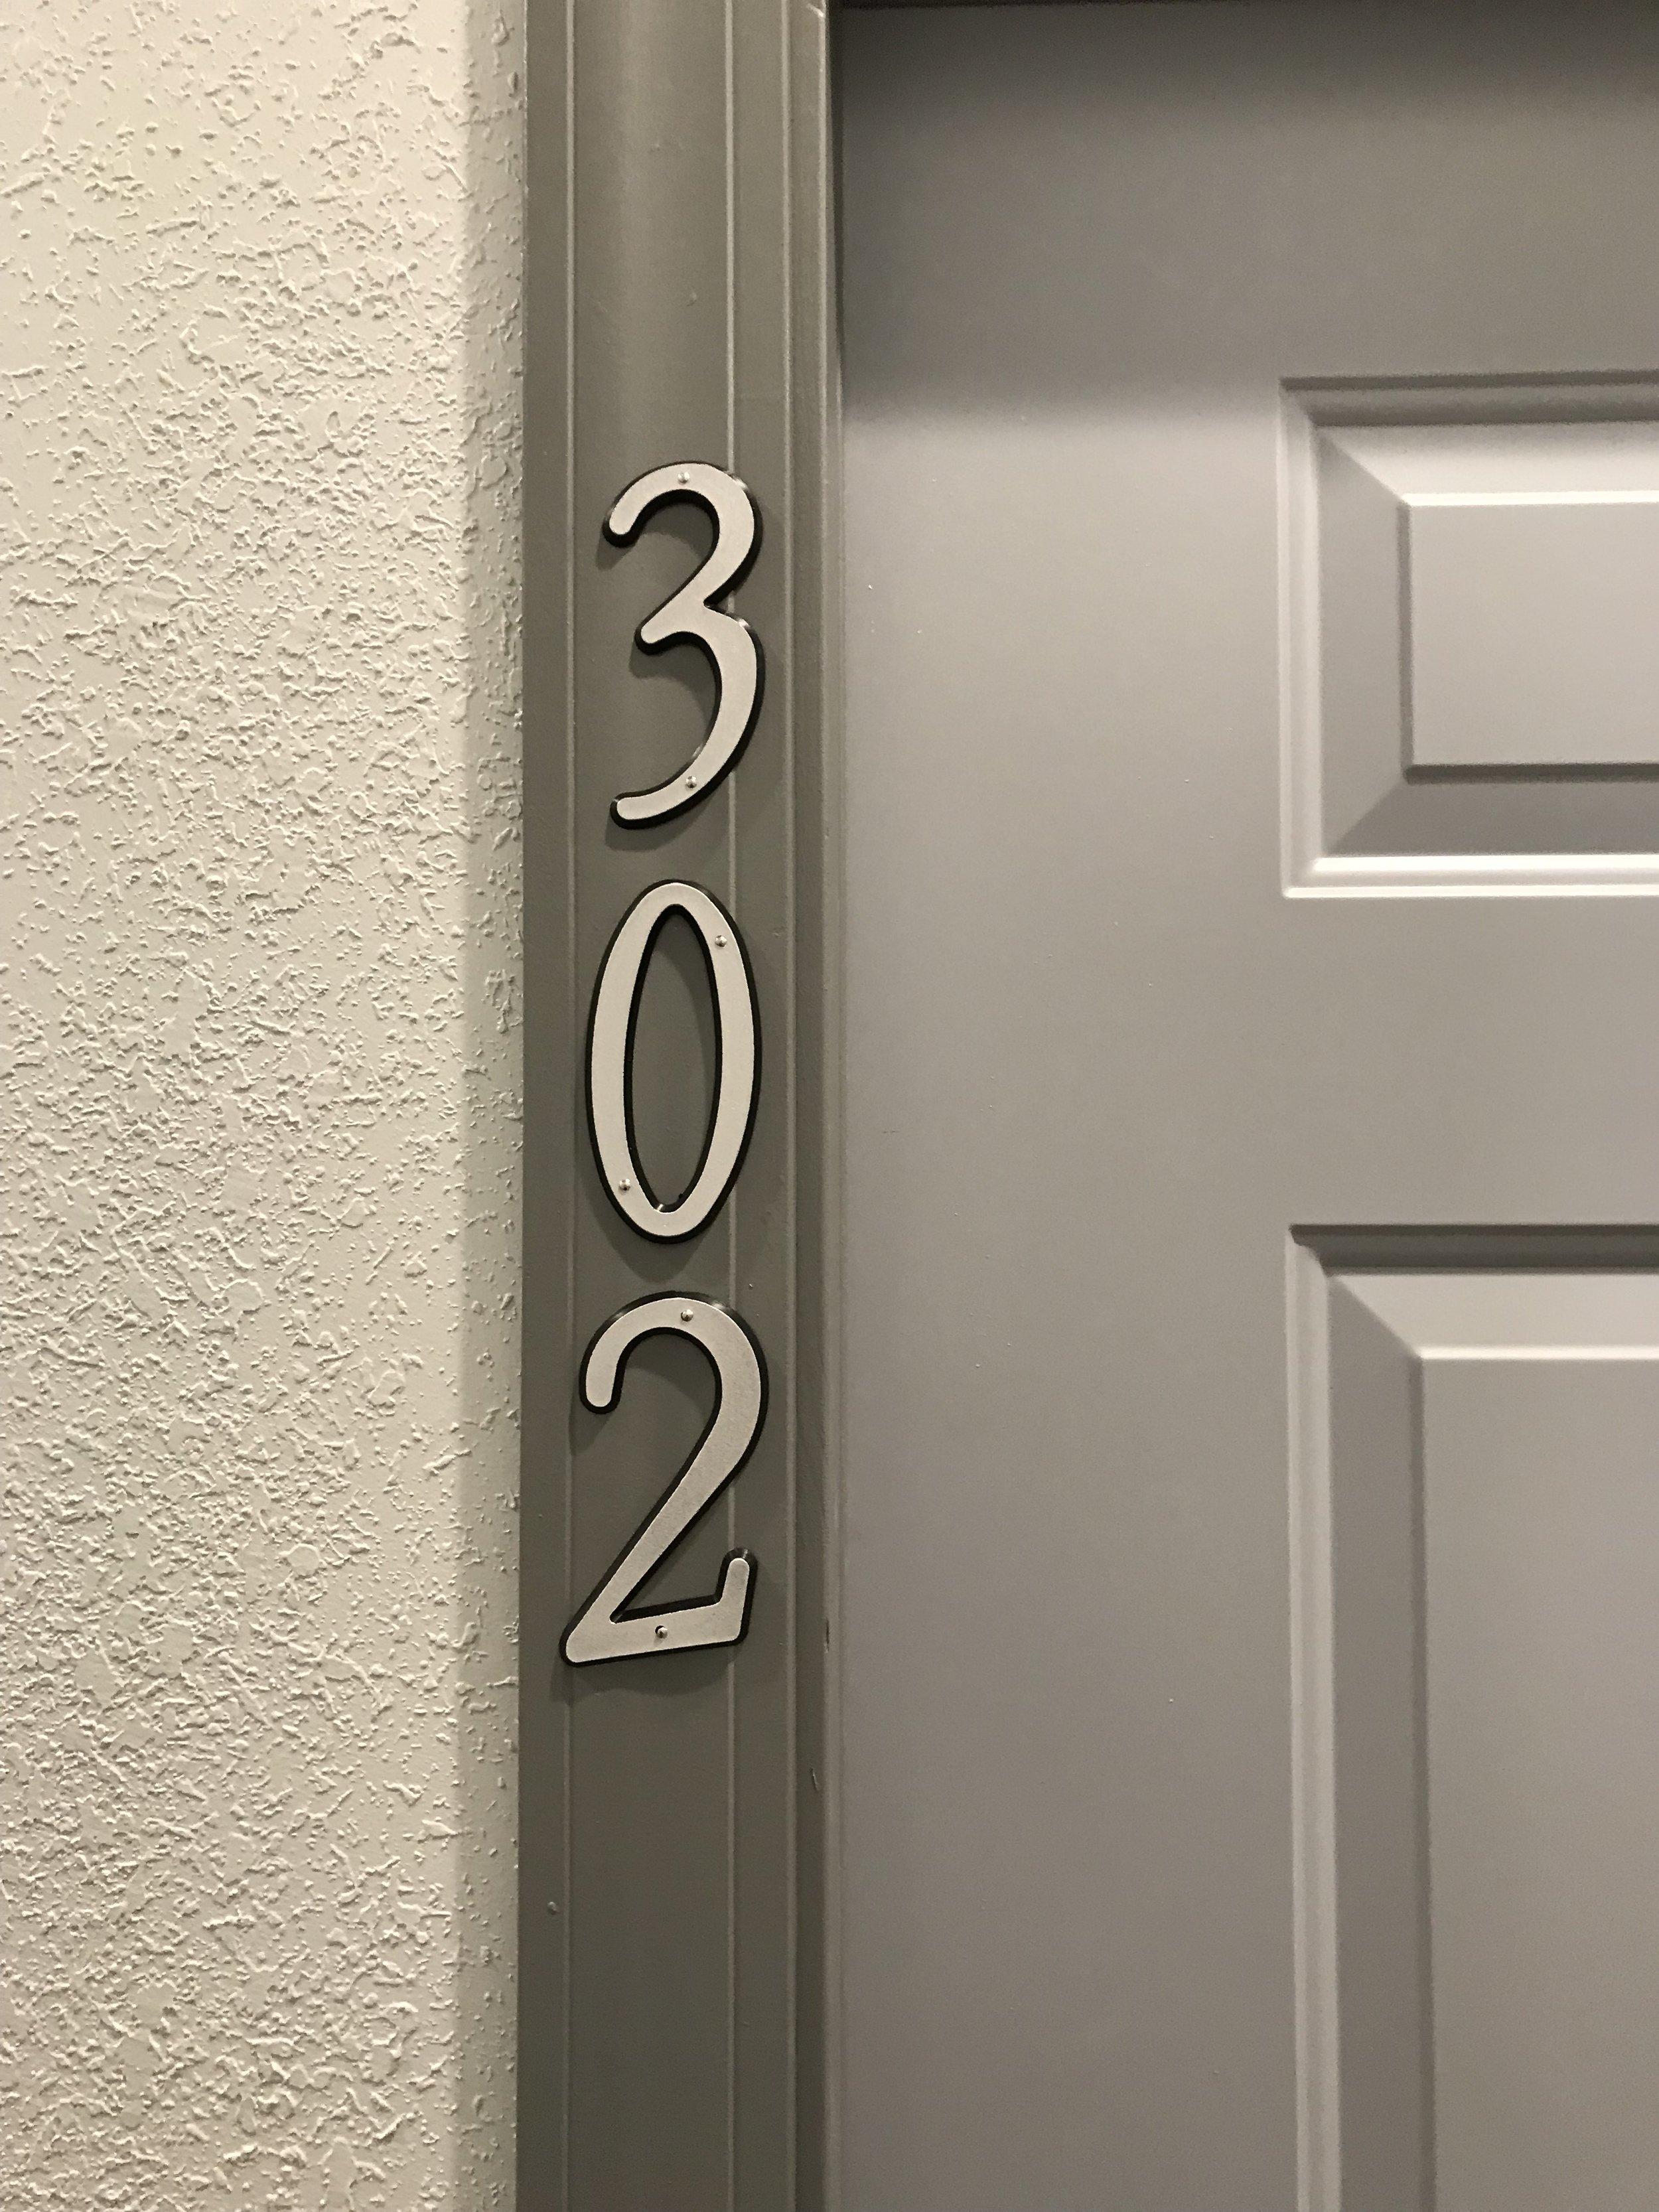 Apartment 302 - 1 Bedroom